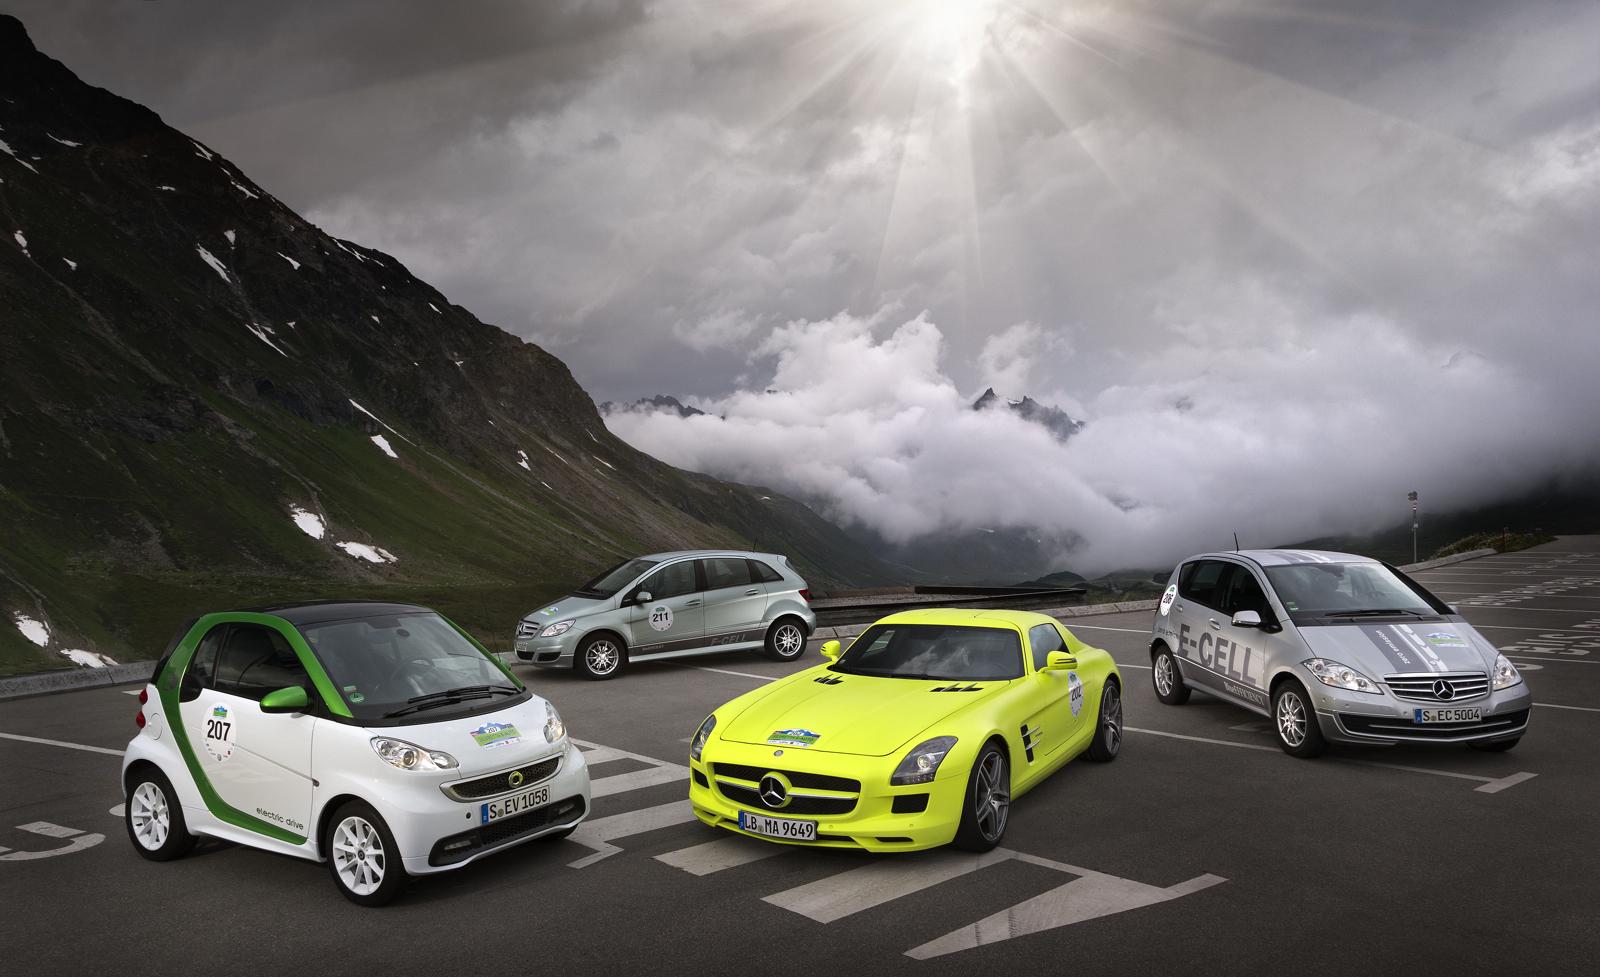 Sls amg e cell to tackle silvretta e car rally for Mercedes benz austria